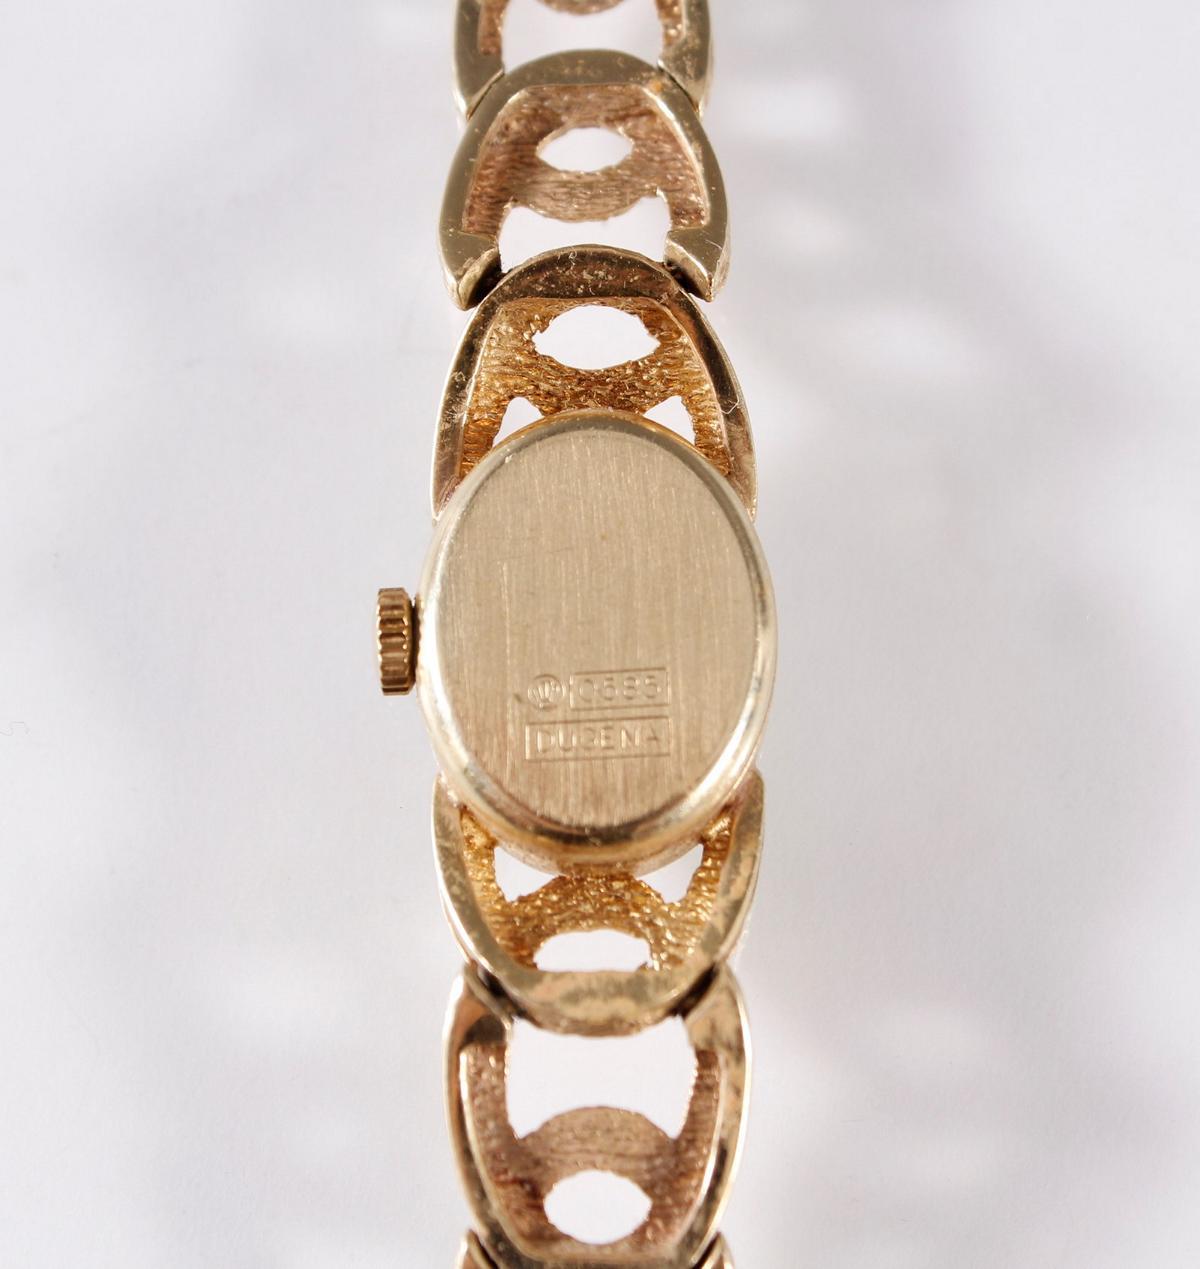 Dugena Damenarmbanduhr, 14 Karat Gelbgold-3